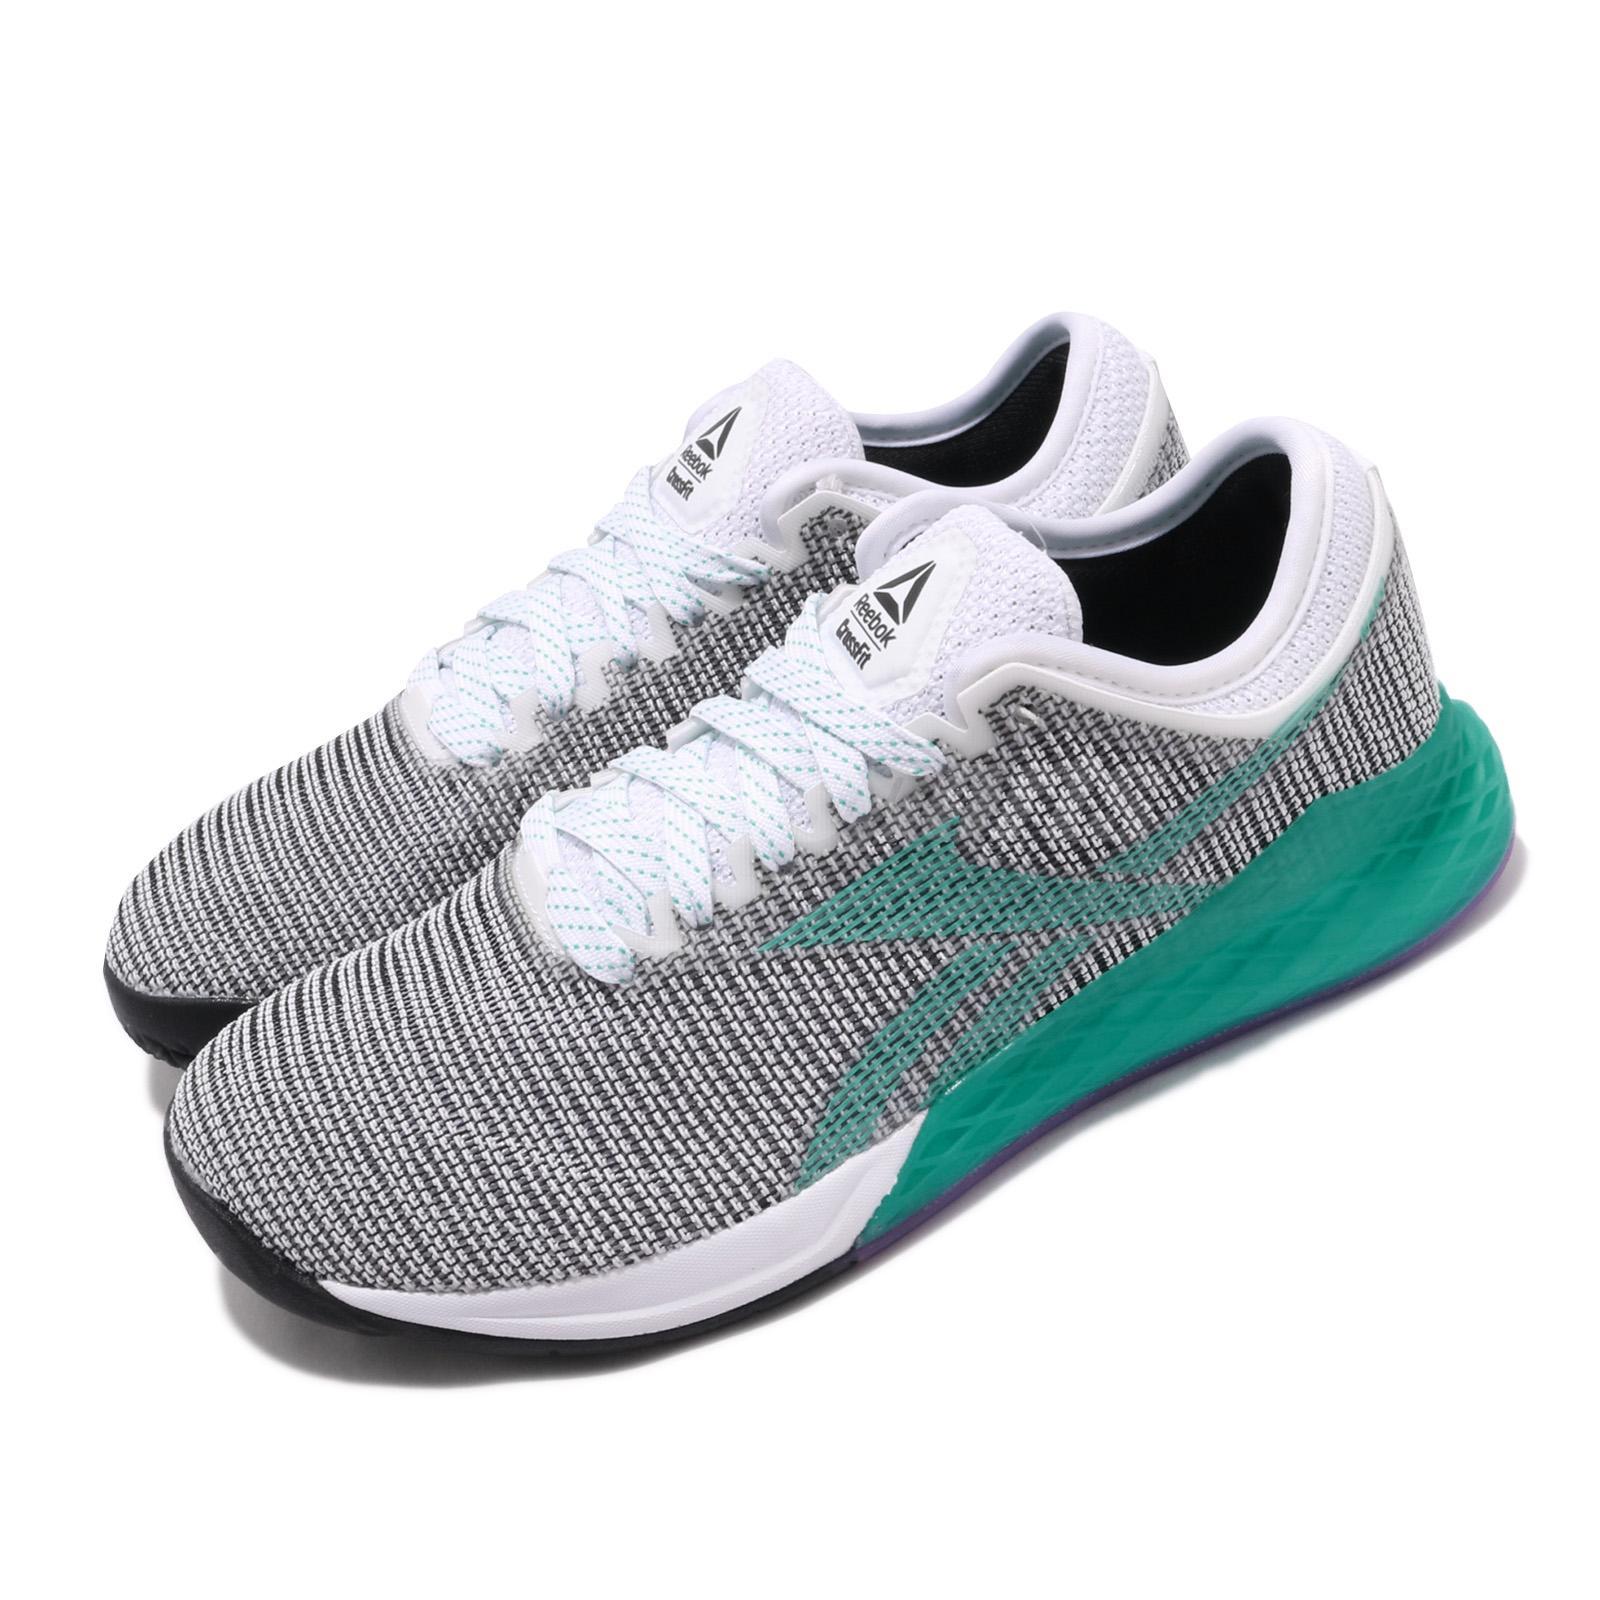 women's crossfit nano shoes